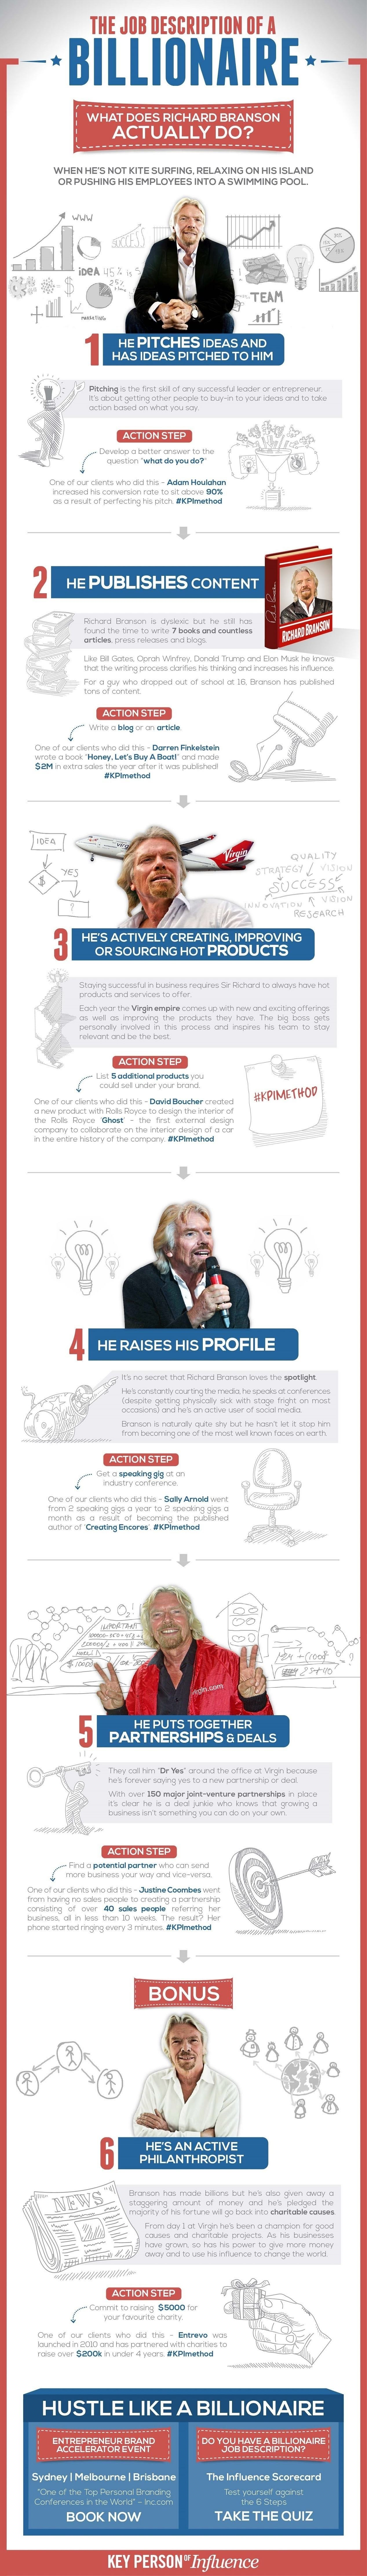 Sir Richard Branson's Job Description #infographic